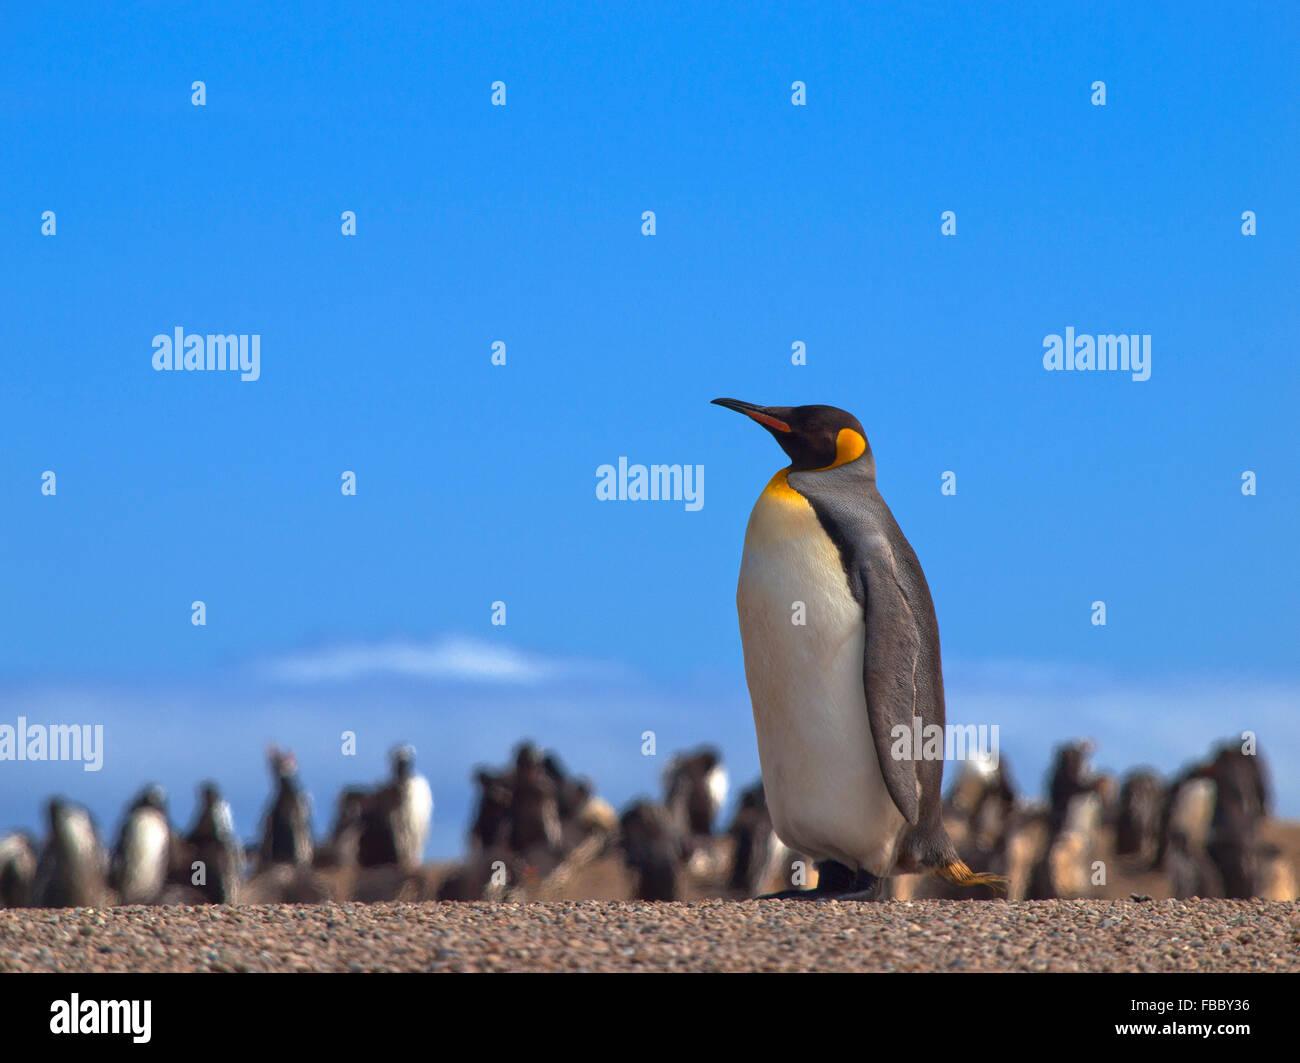 King penguin skyline, South Georgia - Stock Image